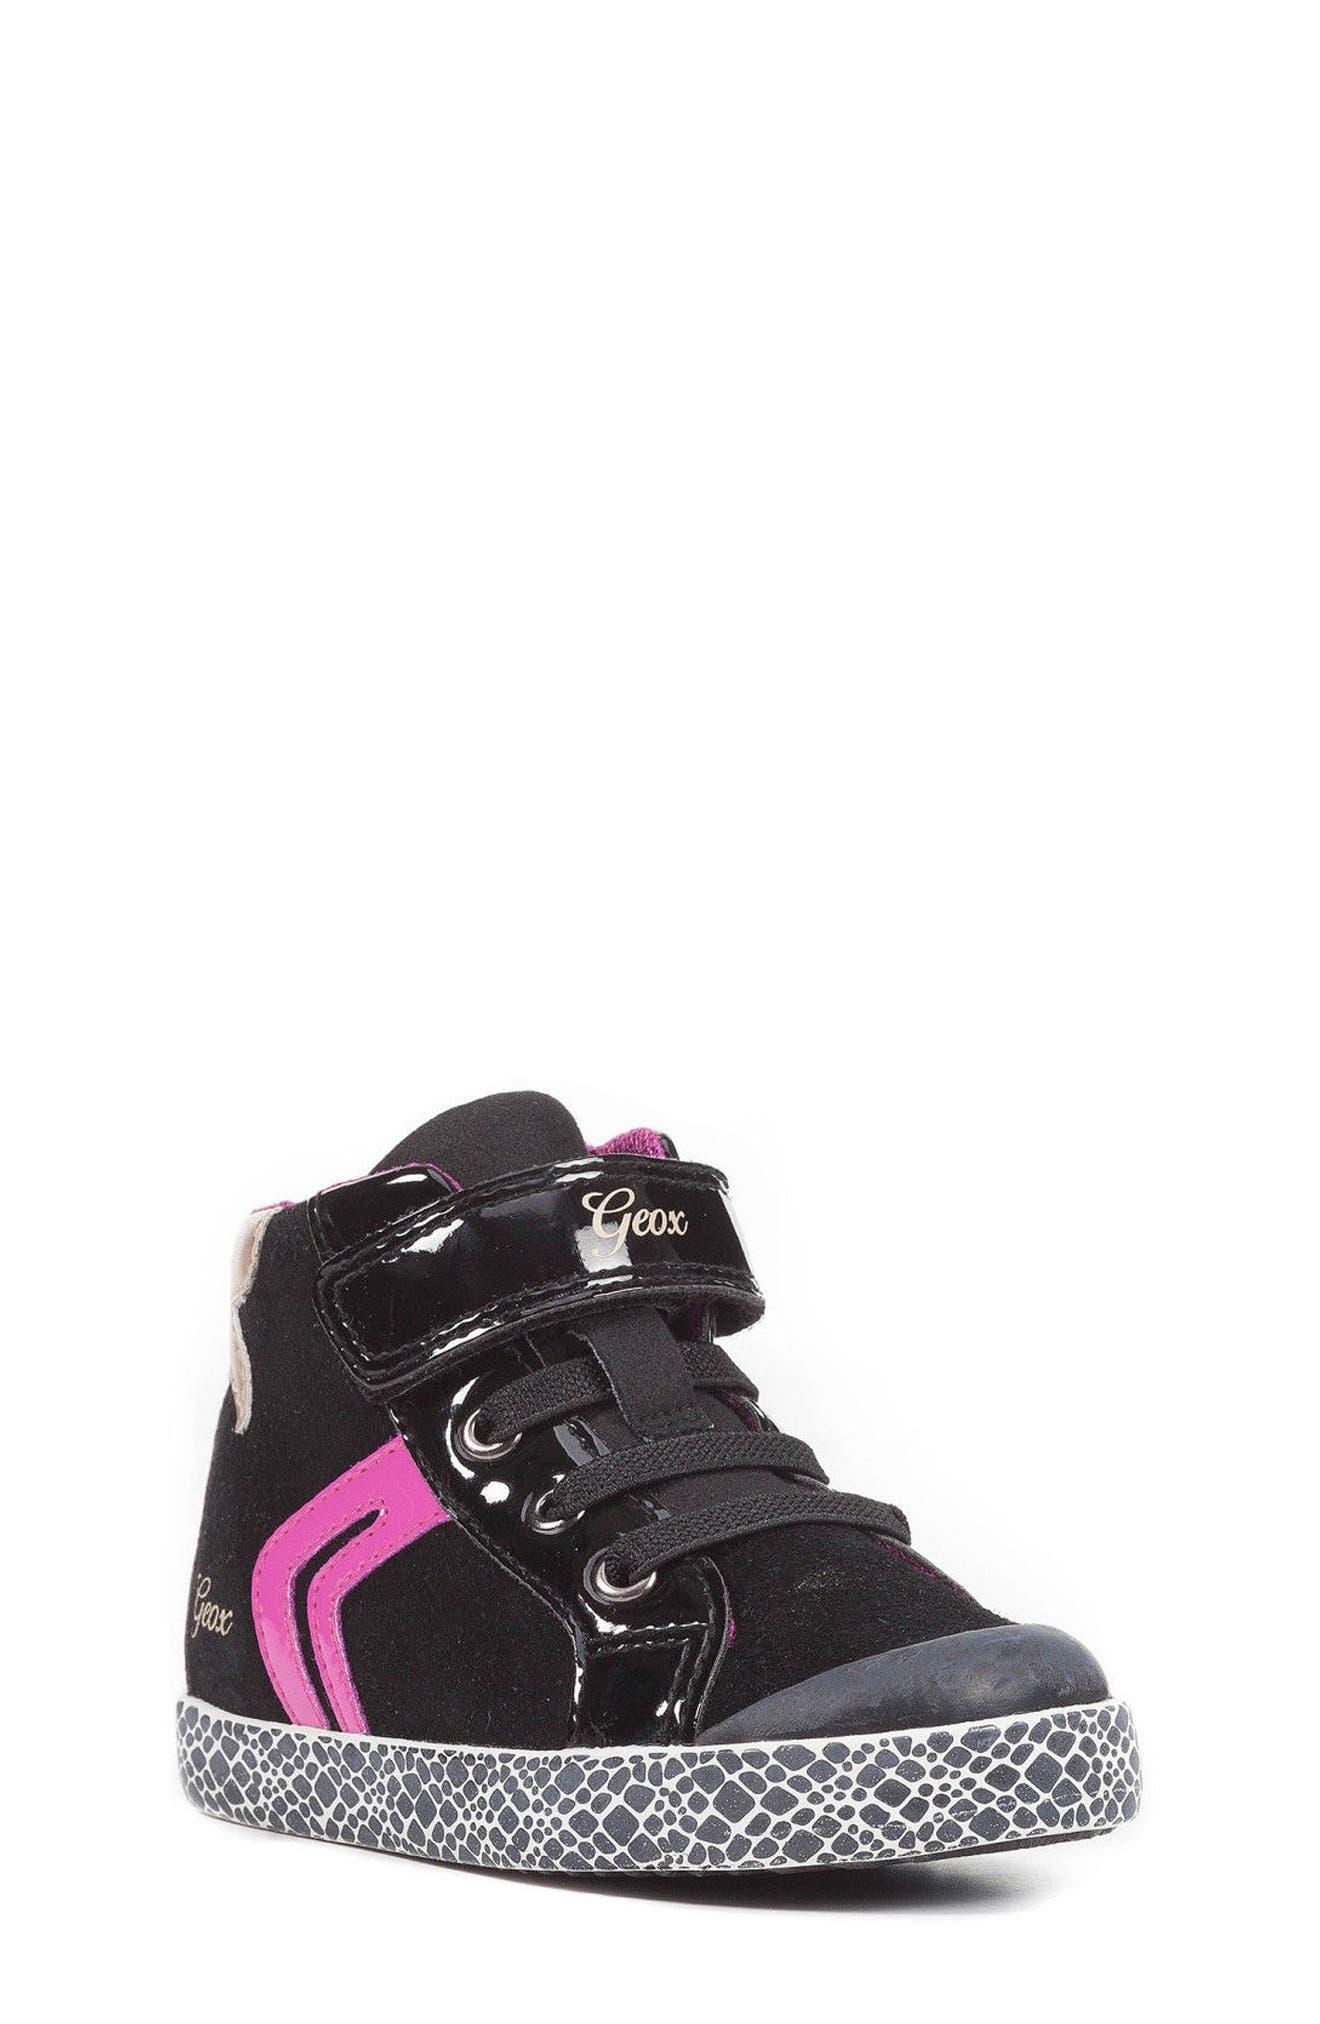 Kiwi Girl High Top Sneaker,                         Main,                         color, Black/ Cyclamen